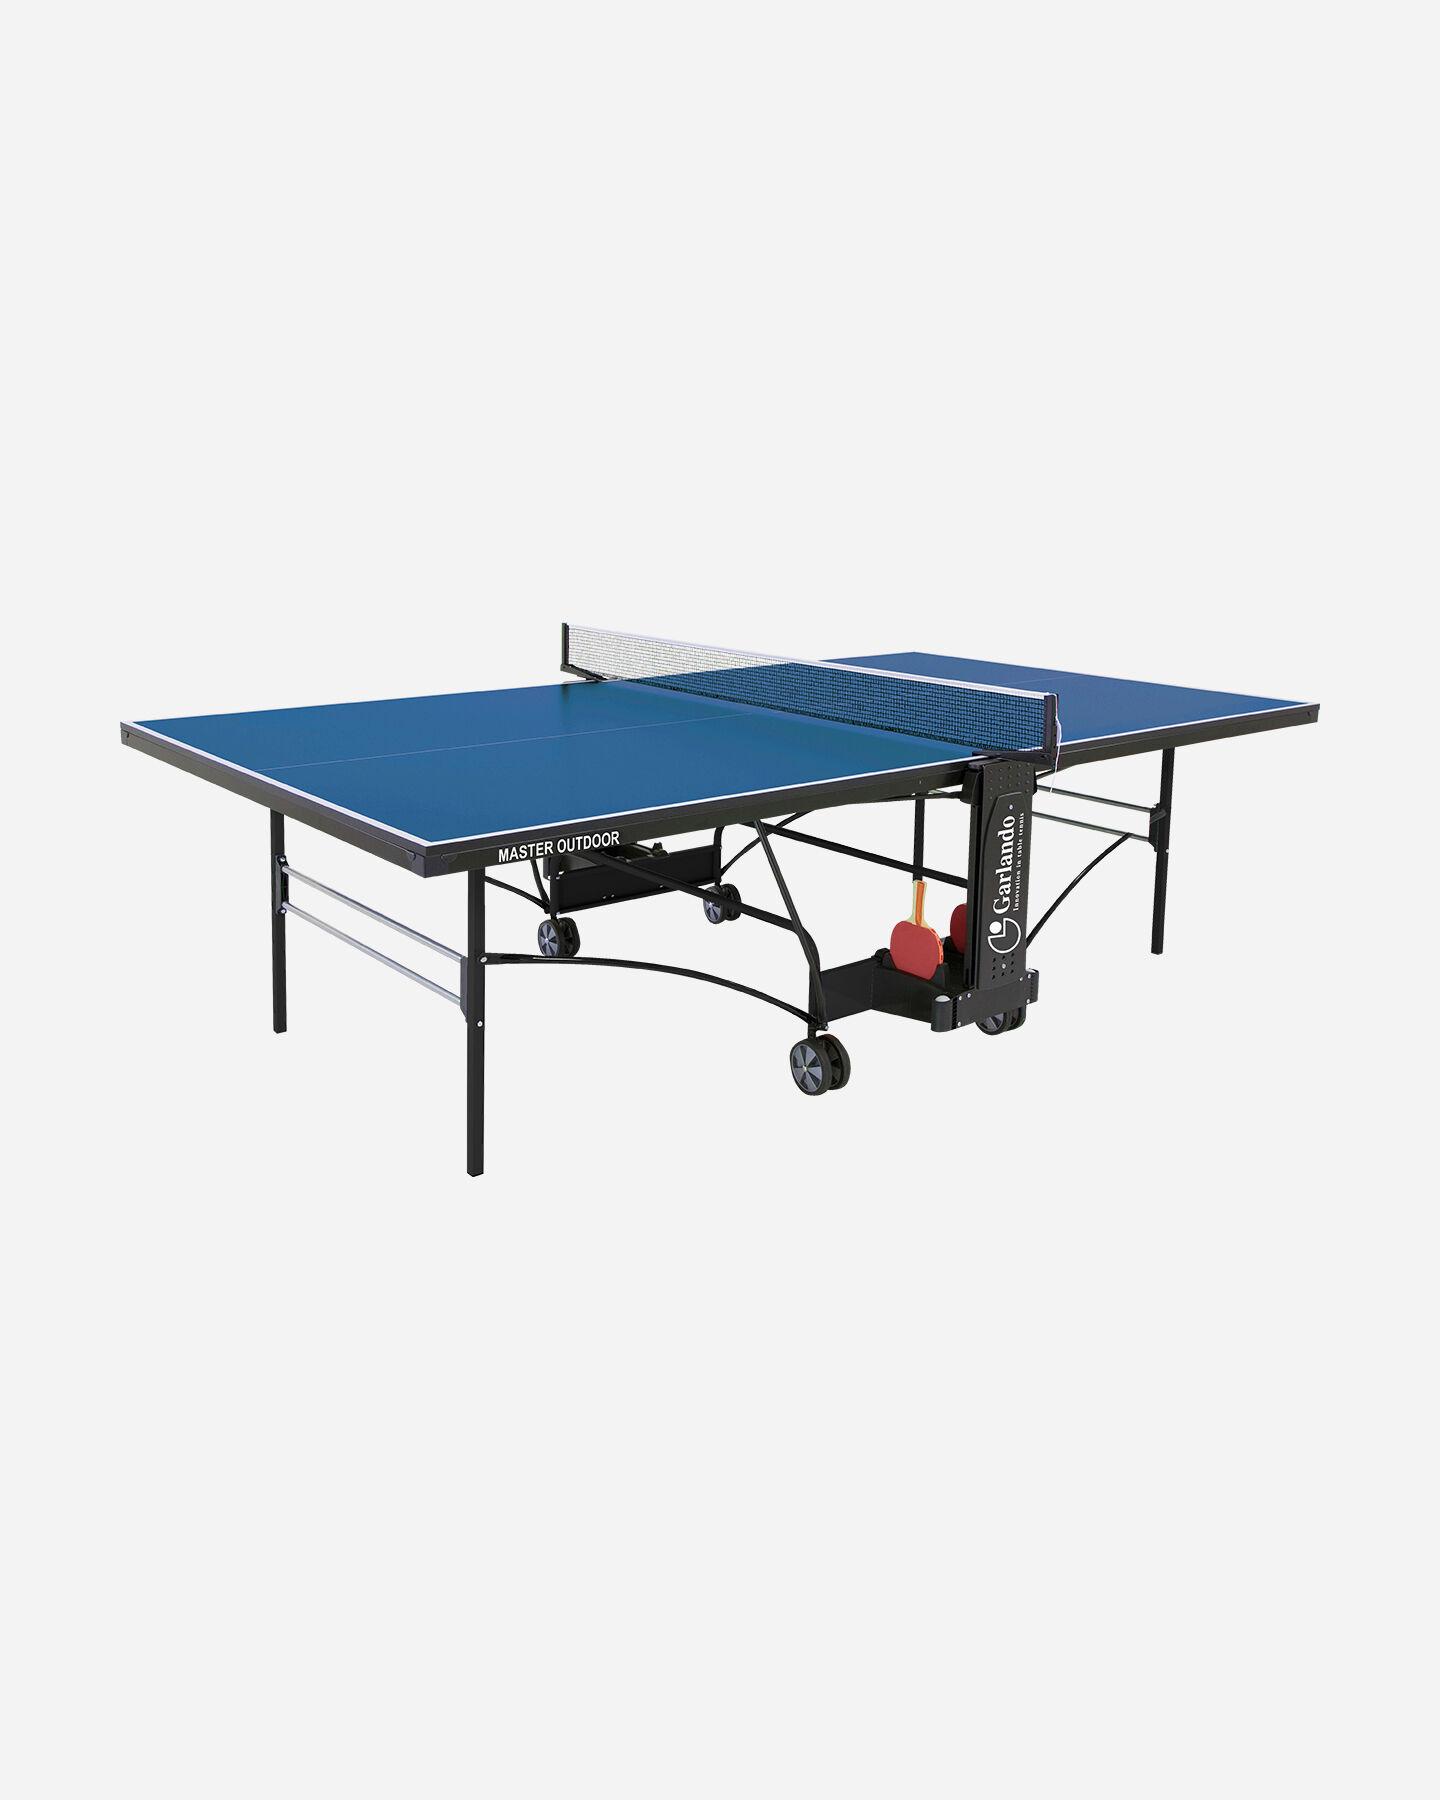 Tavolo ping pong GARLANDO MASTER OUTDOOR S1225845|N.D.|UNI scatto 0